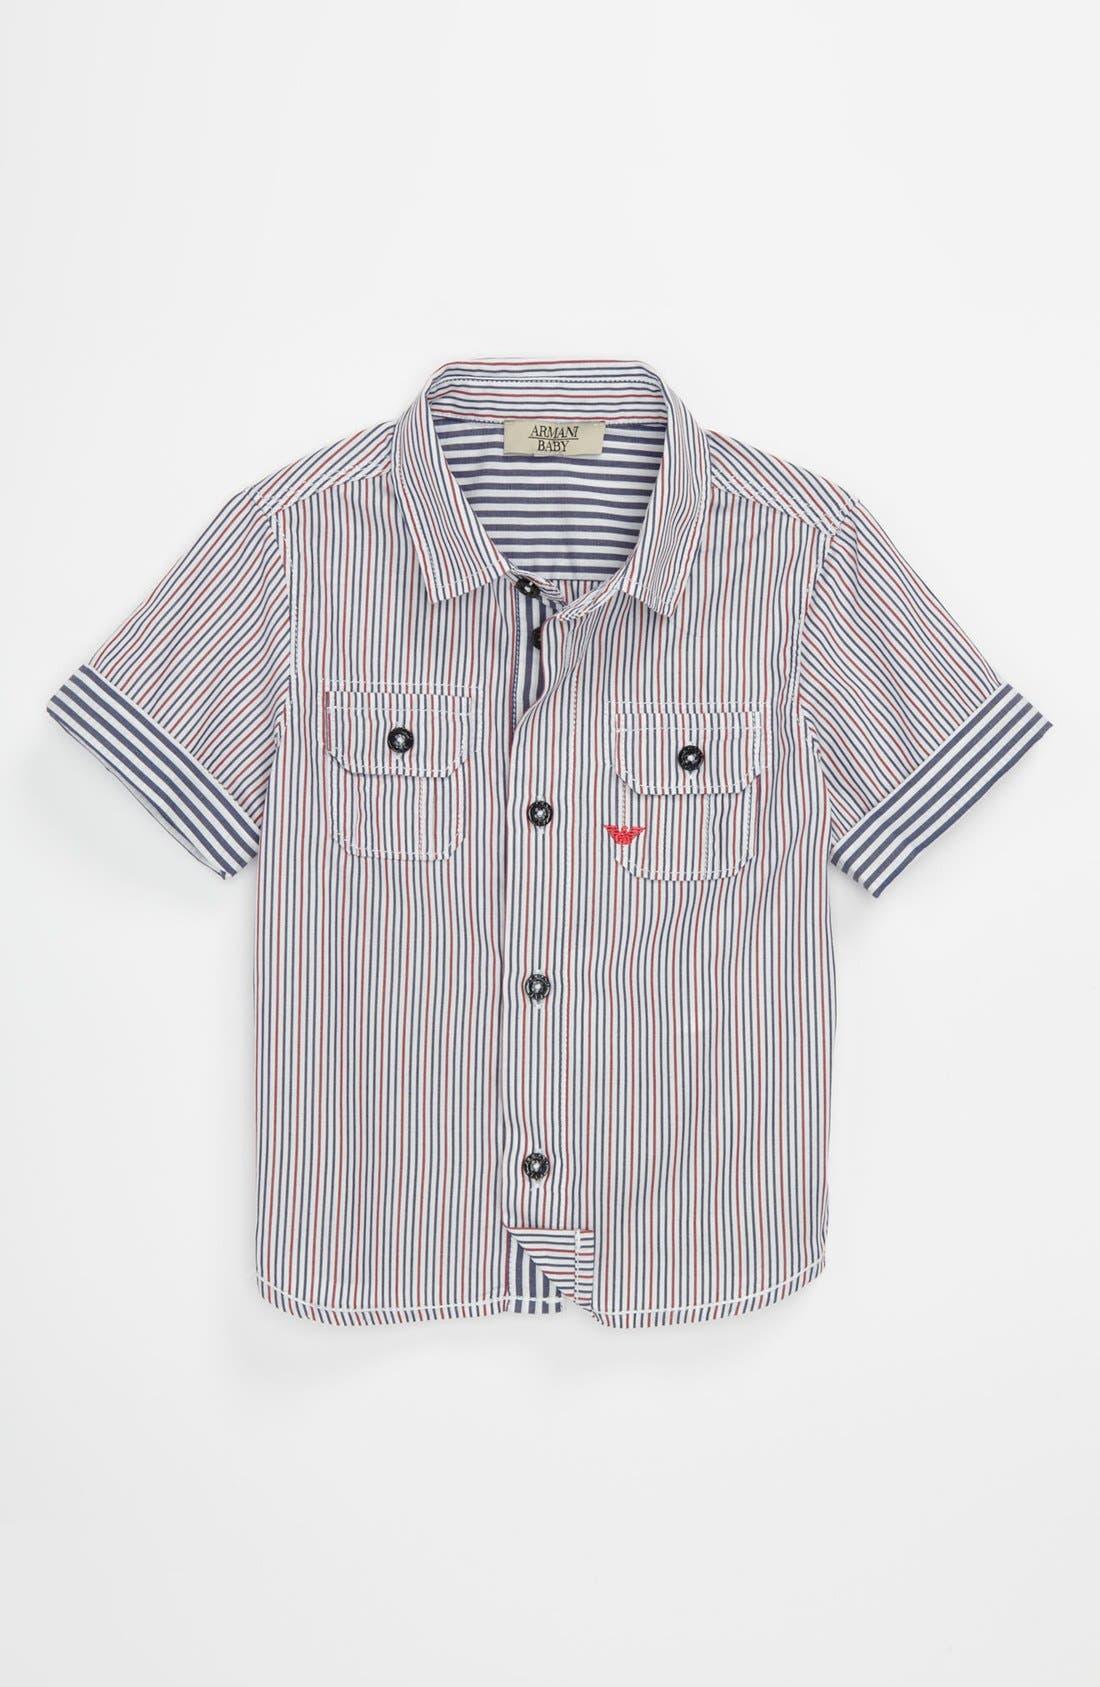 Main Image - Armani Junior Stripe Shirt (Baby)